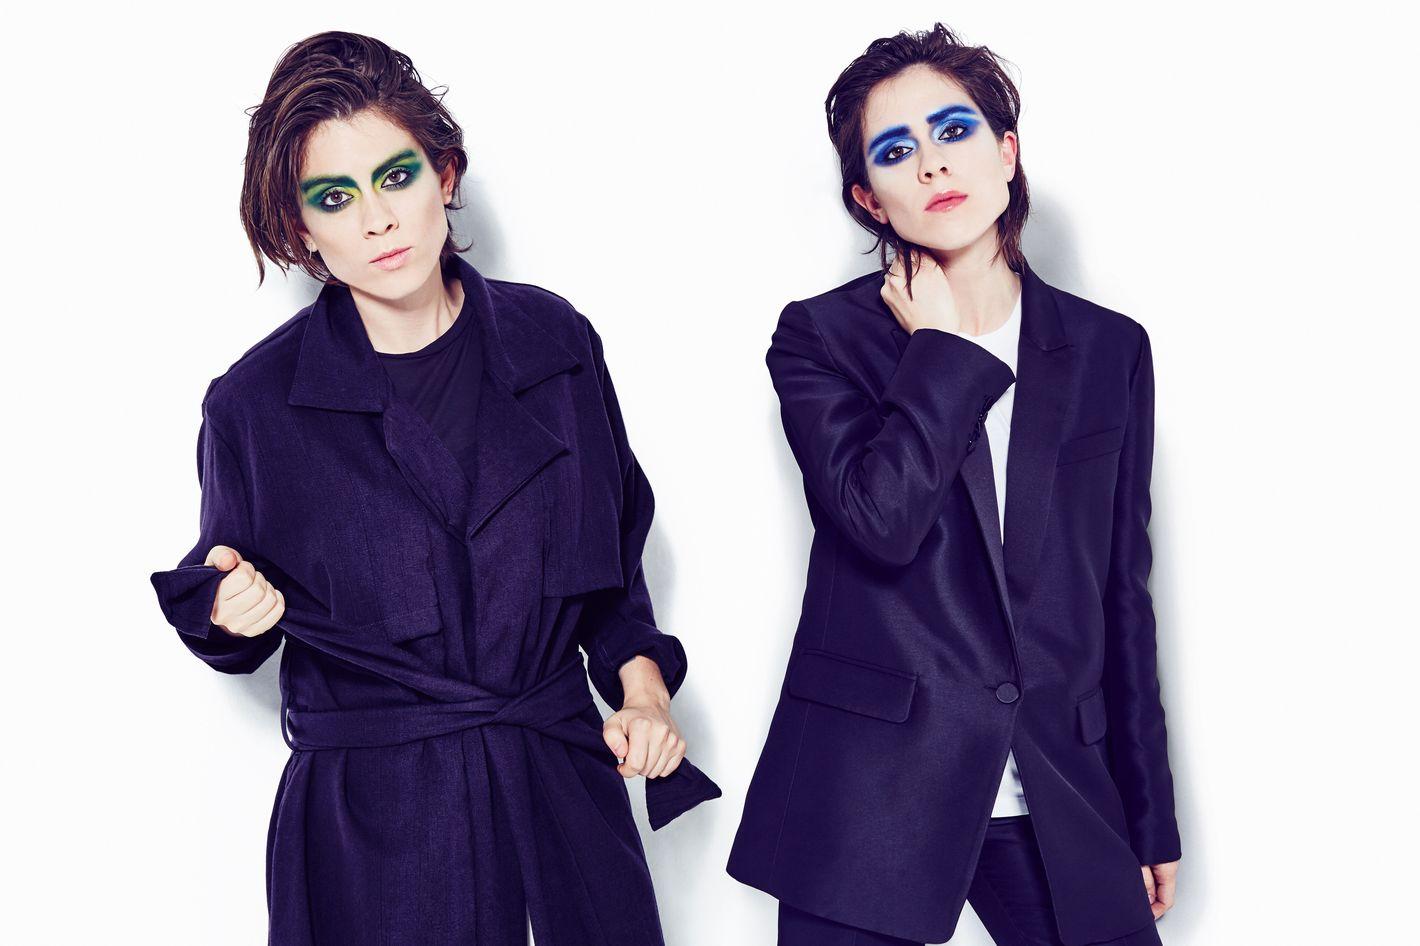 780ad220a Tegan and Sara Quin Pick Their 10 Favorite Tegan and Sara Songs